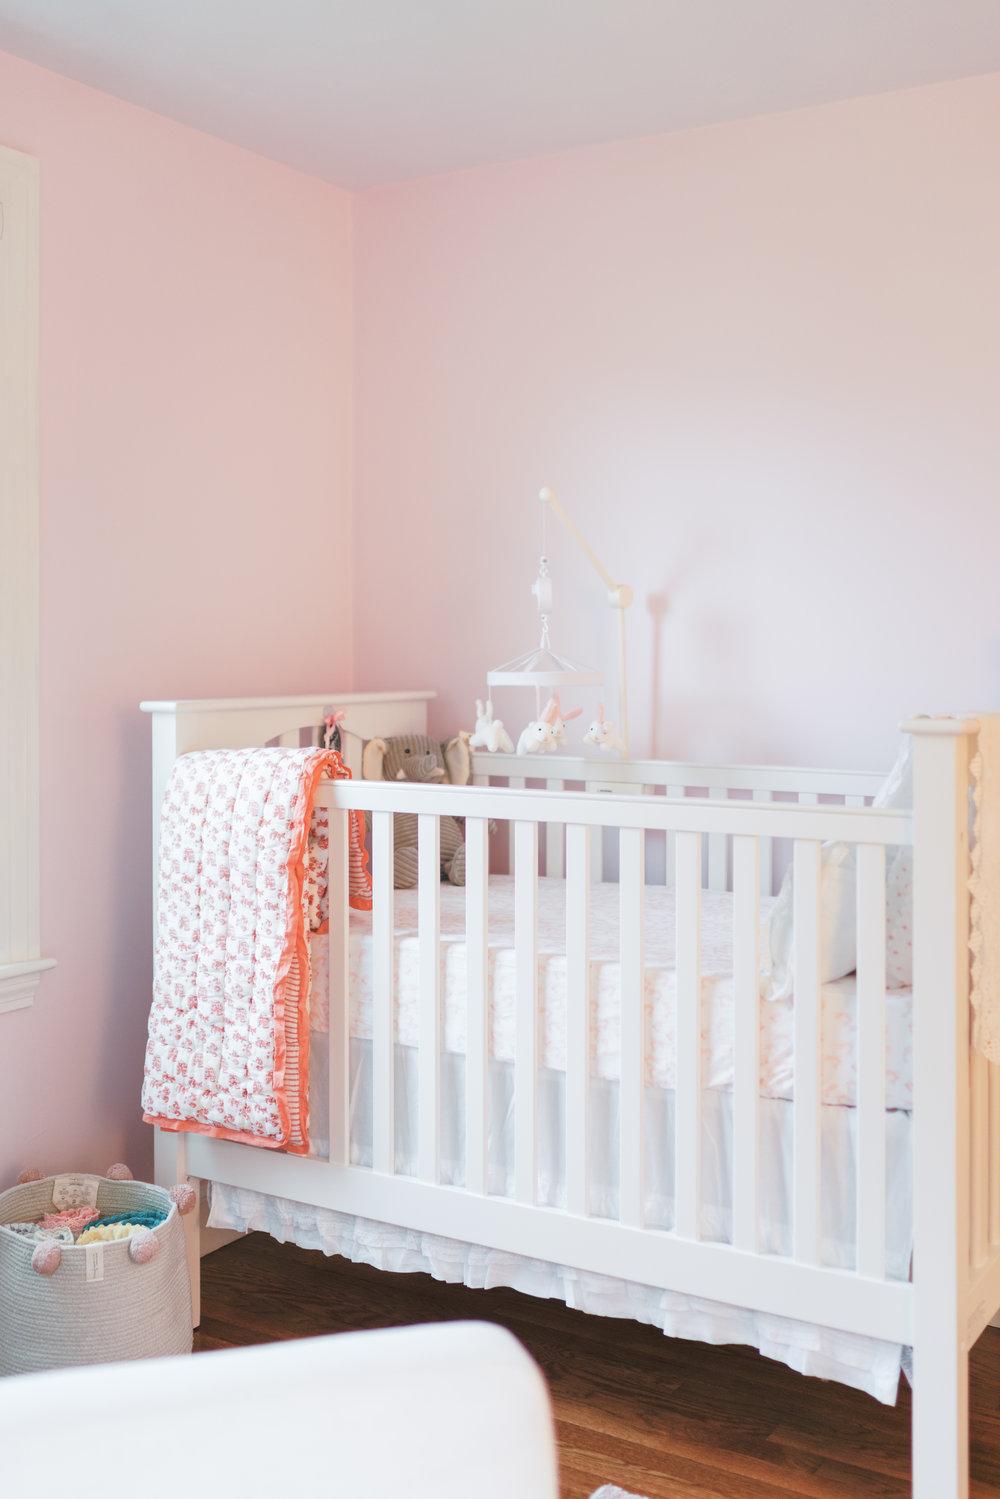 hannah-cochran-photography-emilia-newborn-04094.jpg